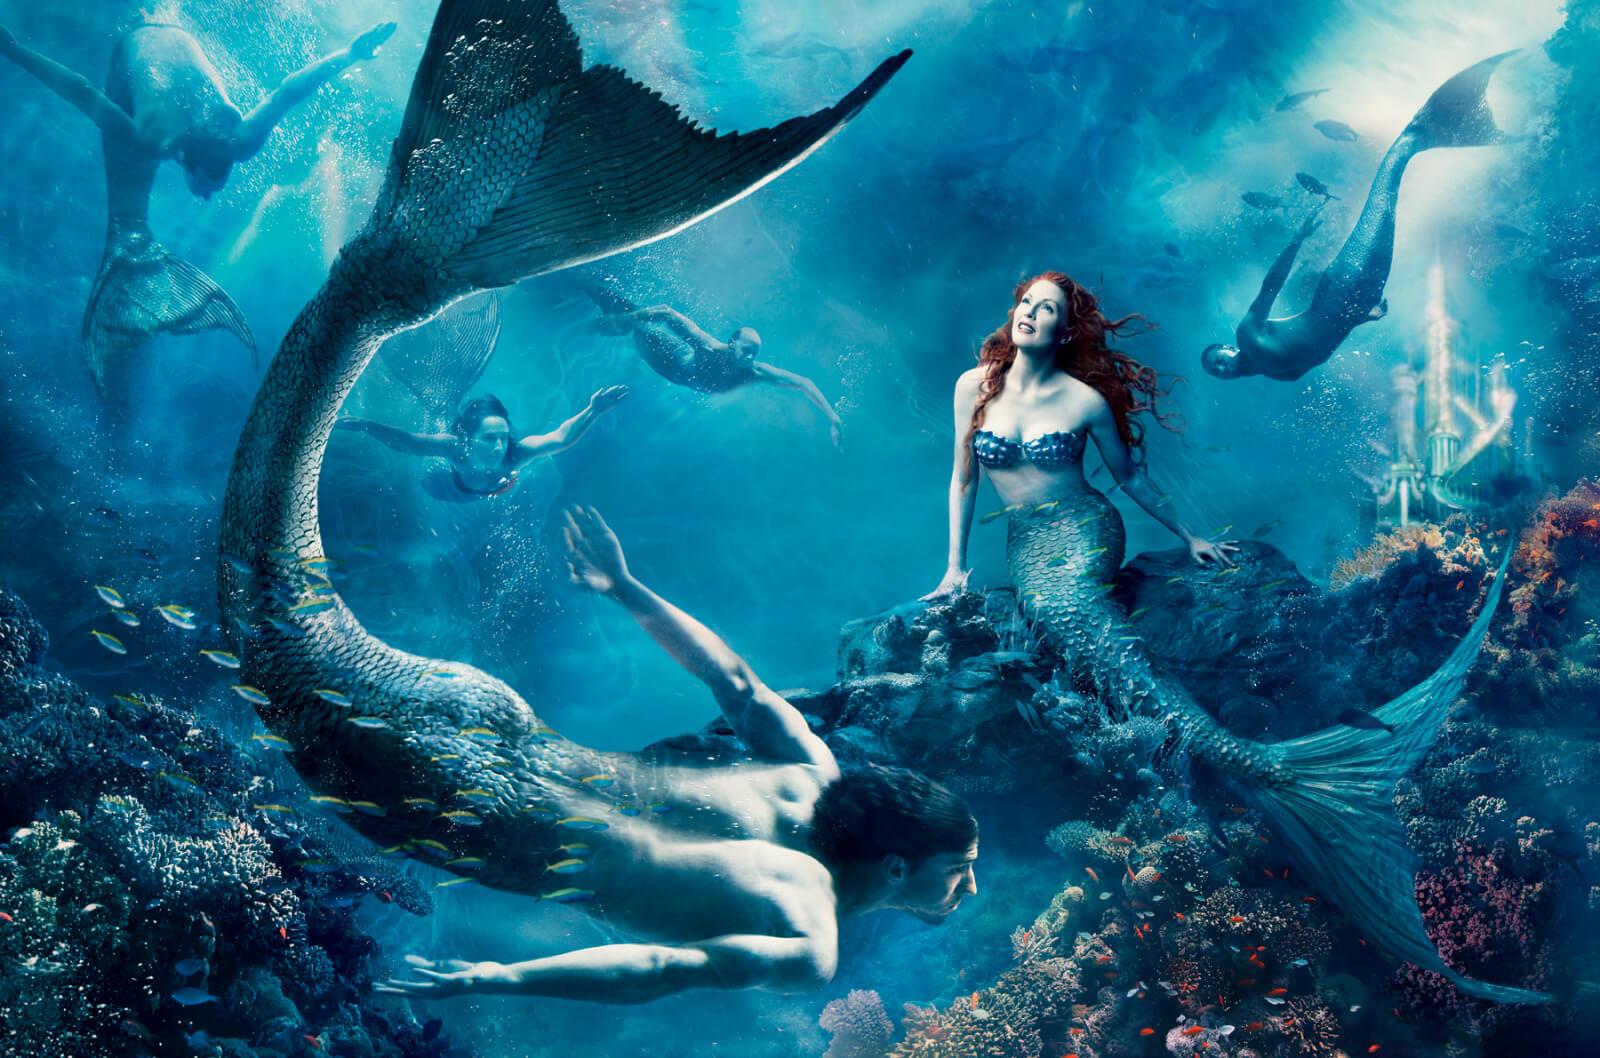 Annie-Leibovitz-Disney-Sirenita-Julianne-Moore-2